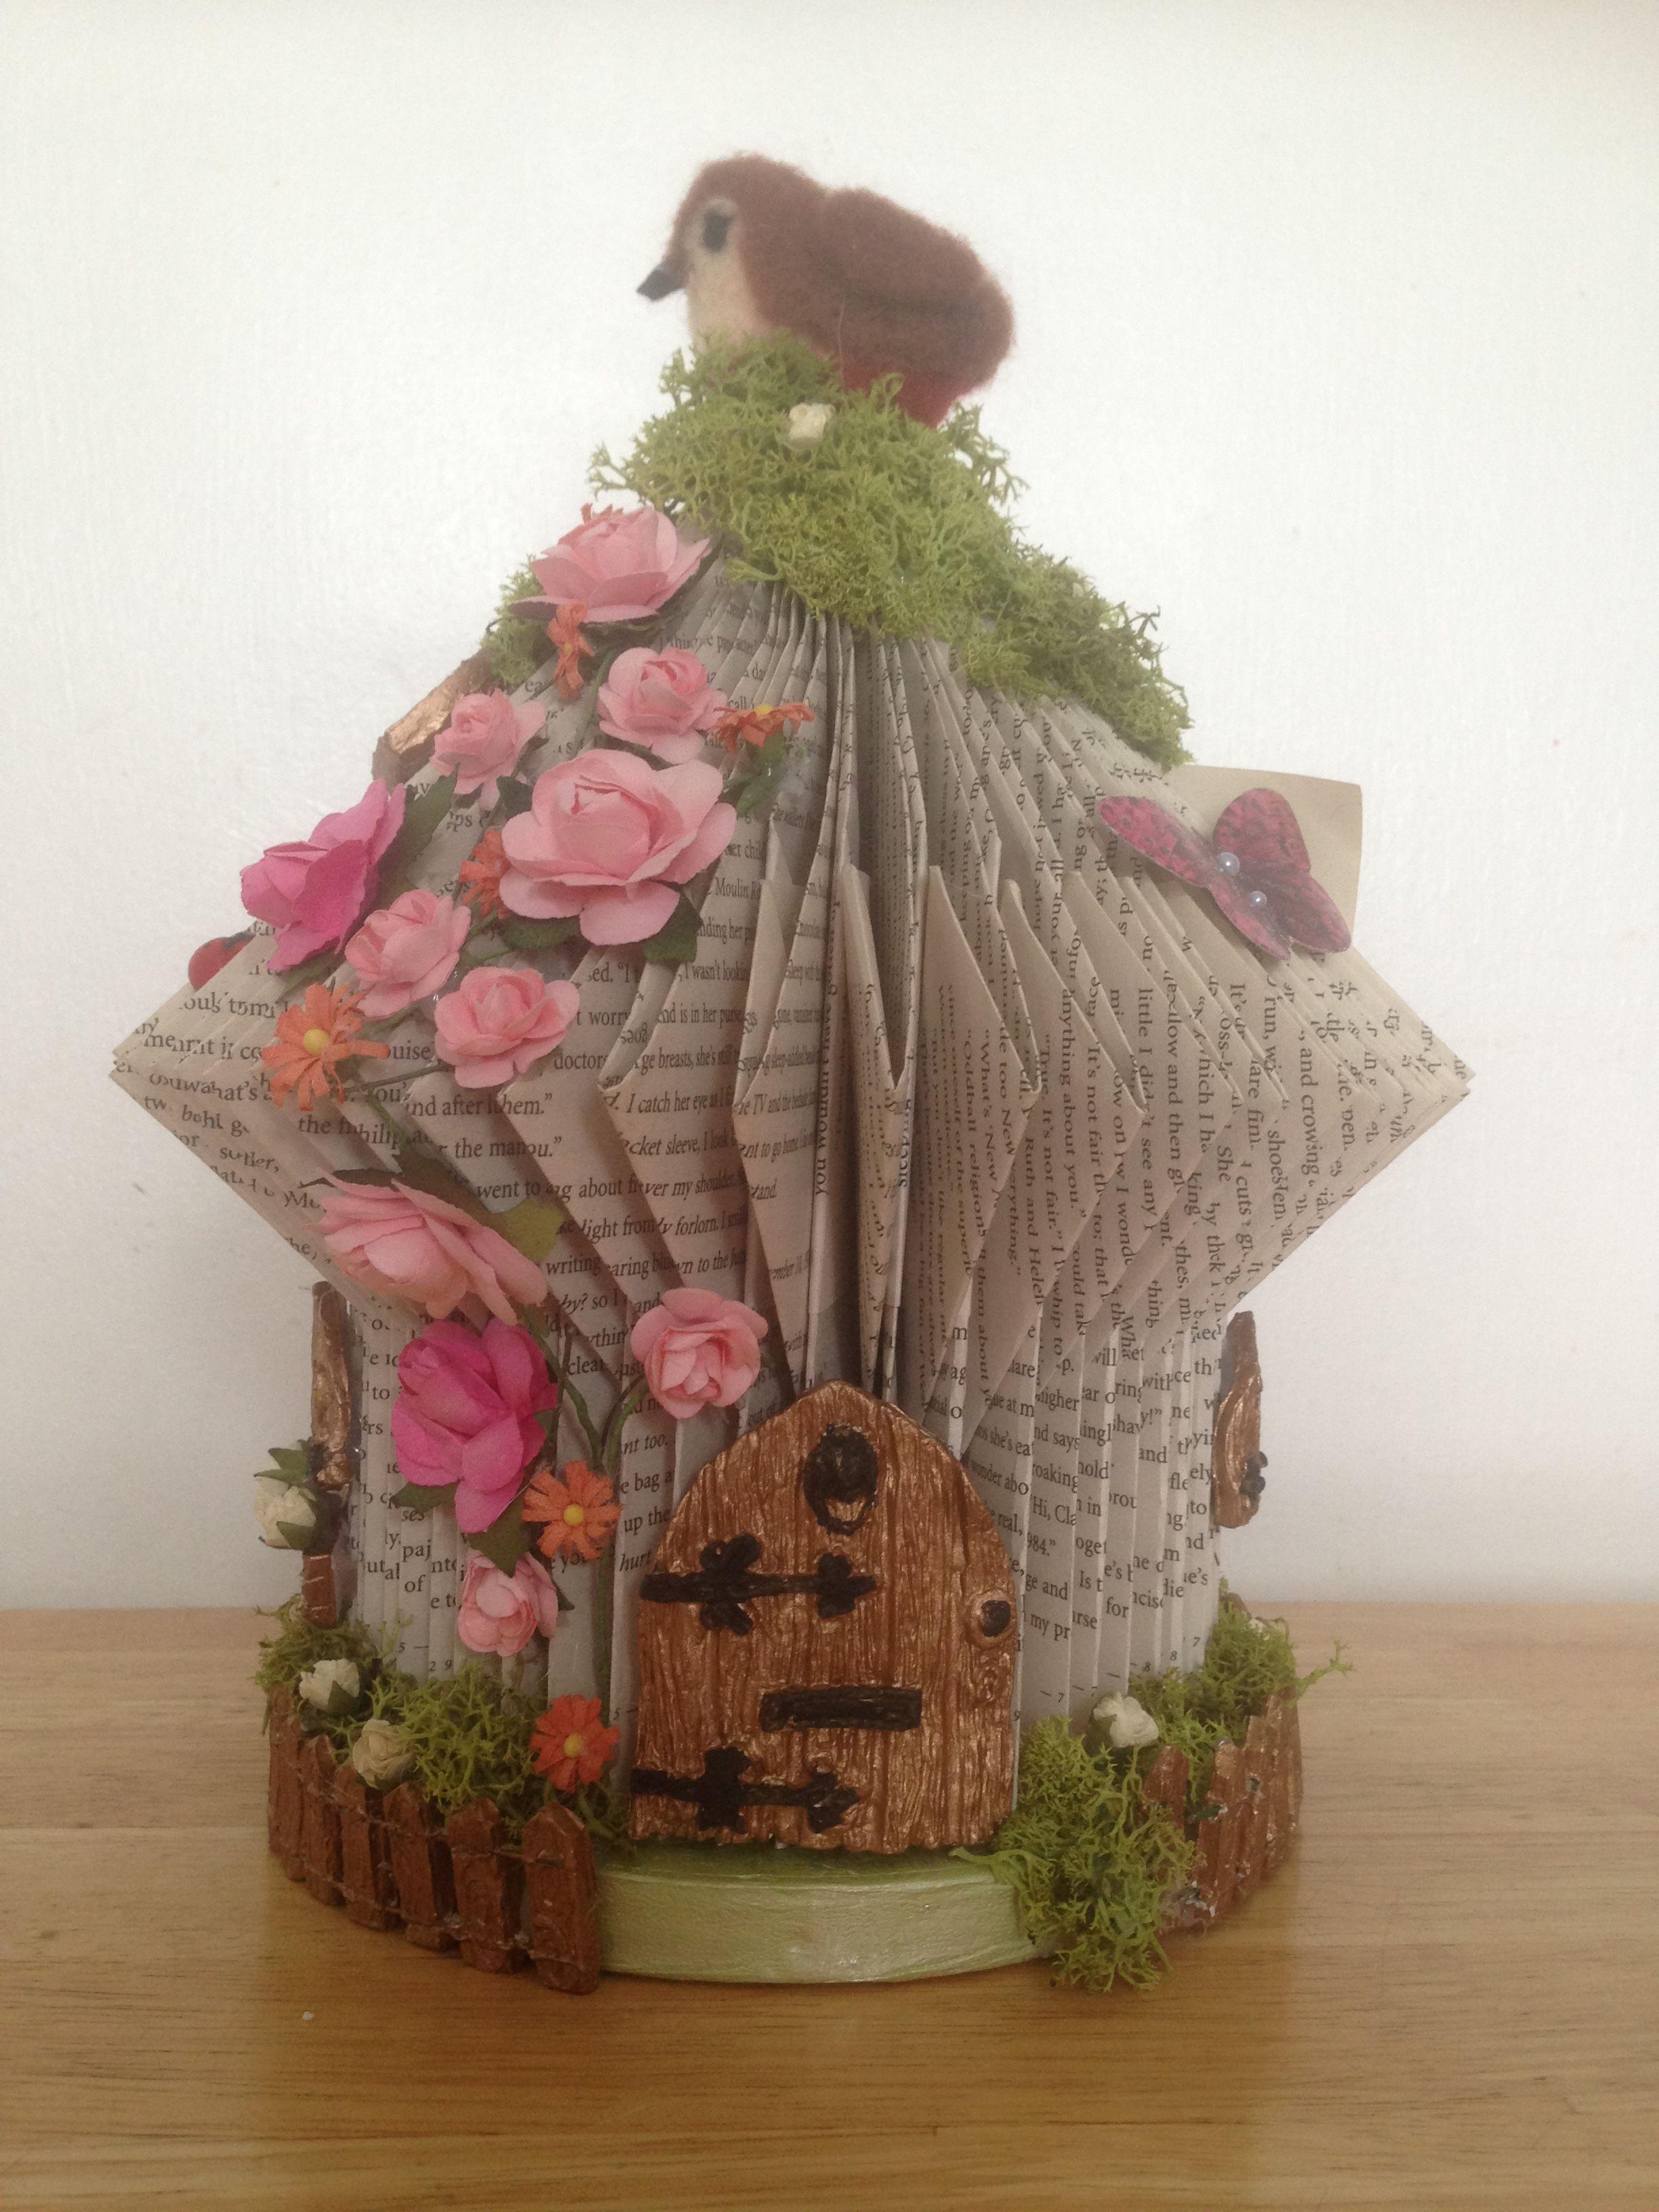 book art fairy house blogs workanyware co uk u2022 rh blogs workanyware co uk Fairy Templates for Cardboard Houses Fairy Houses Books Hard Copy